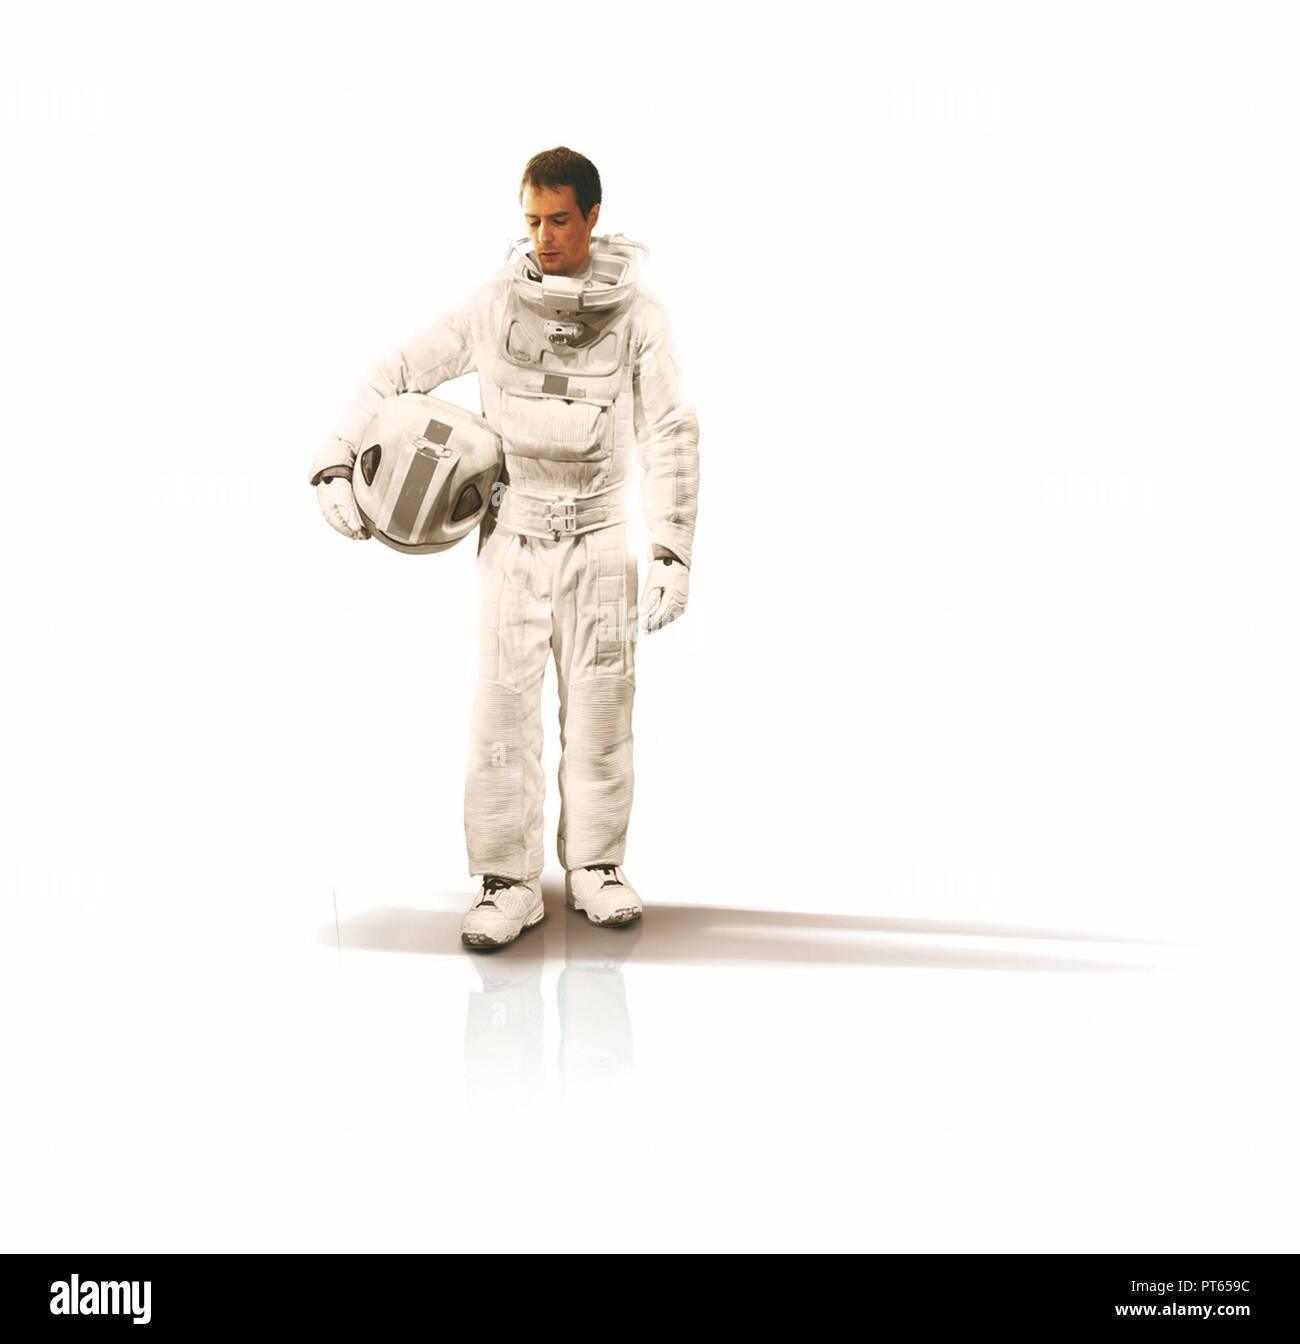 Original film title: MOON. English title: MOON. Year: 2009. Director: DUNCAN JONES. Stars: SAM ROCKWELL. Credit: XINGU FILMS / TILLE, MARK / Album - Stock Image